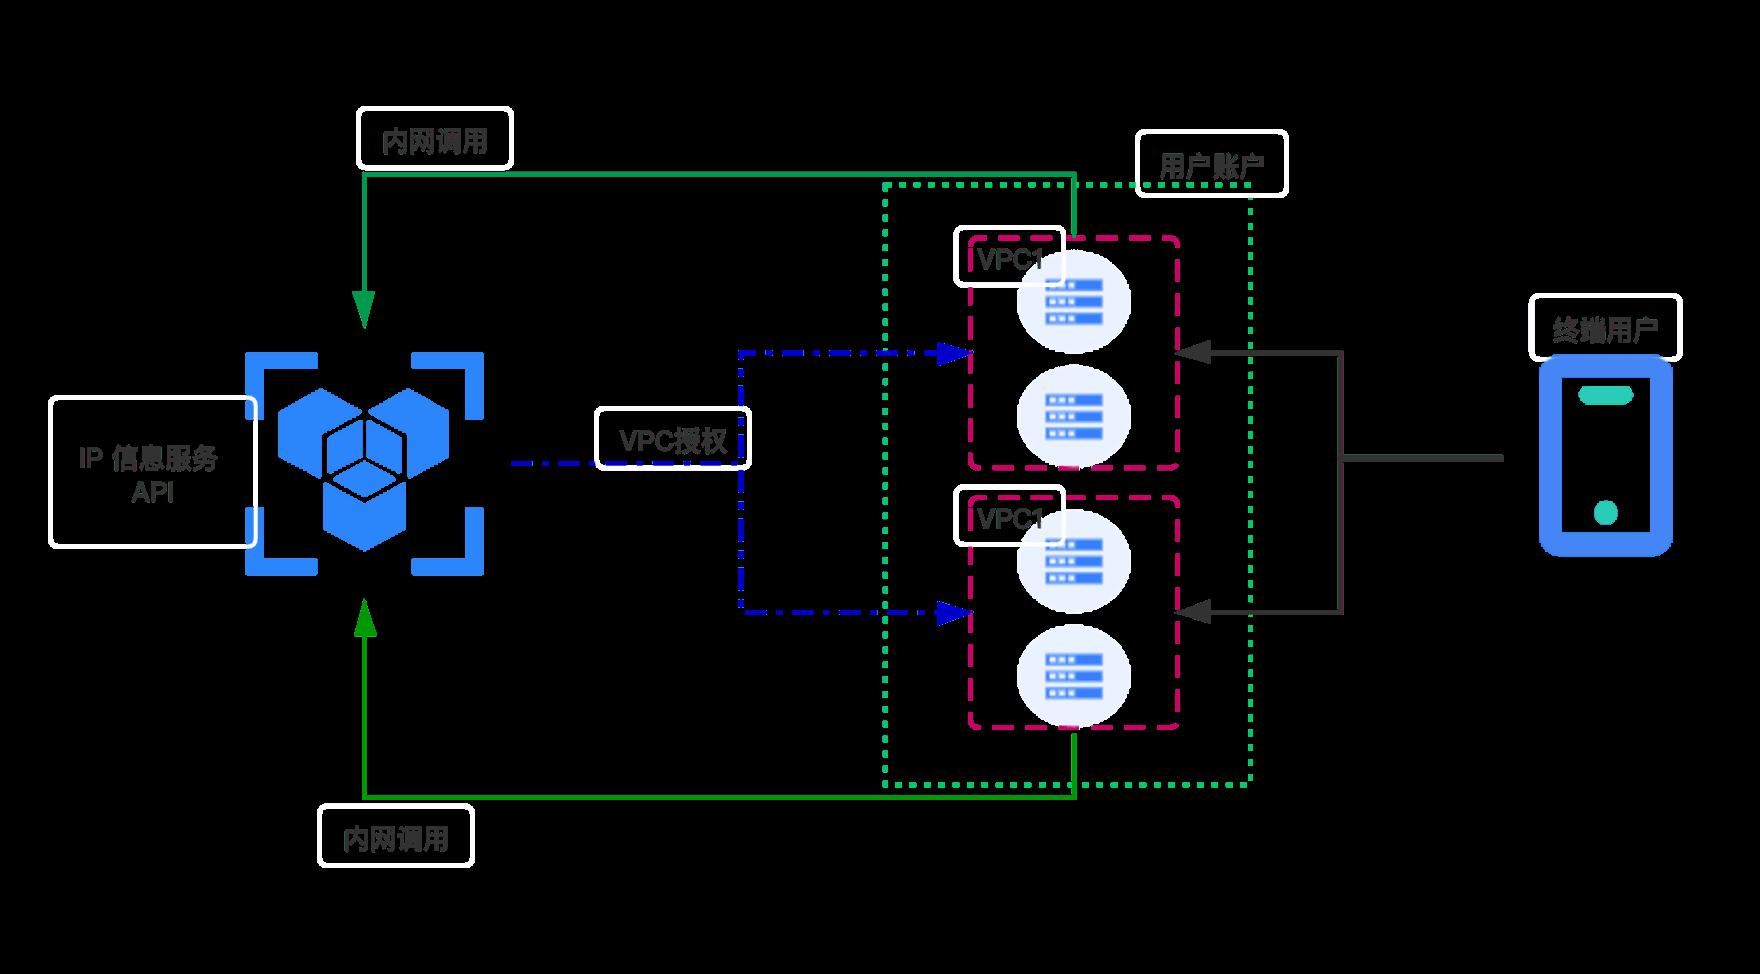 UCloud优刻得IP信息服务上线,与IPIP.NET原厂合作,内网调用、千次只需0.25元